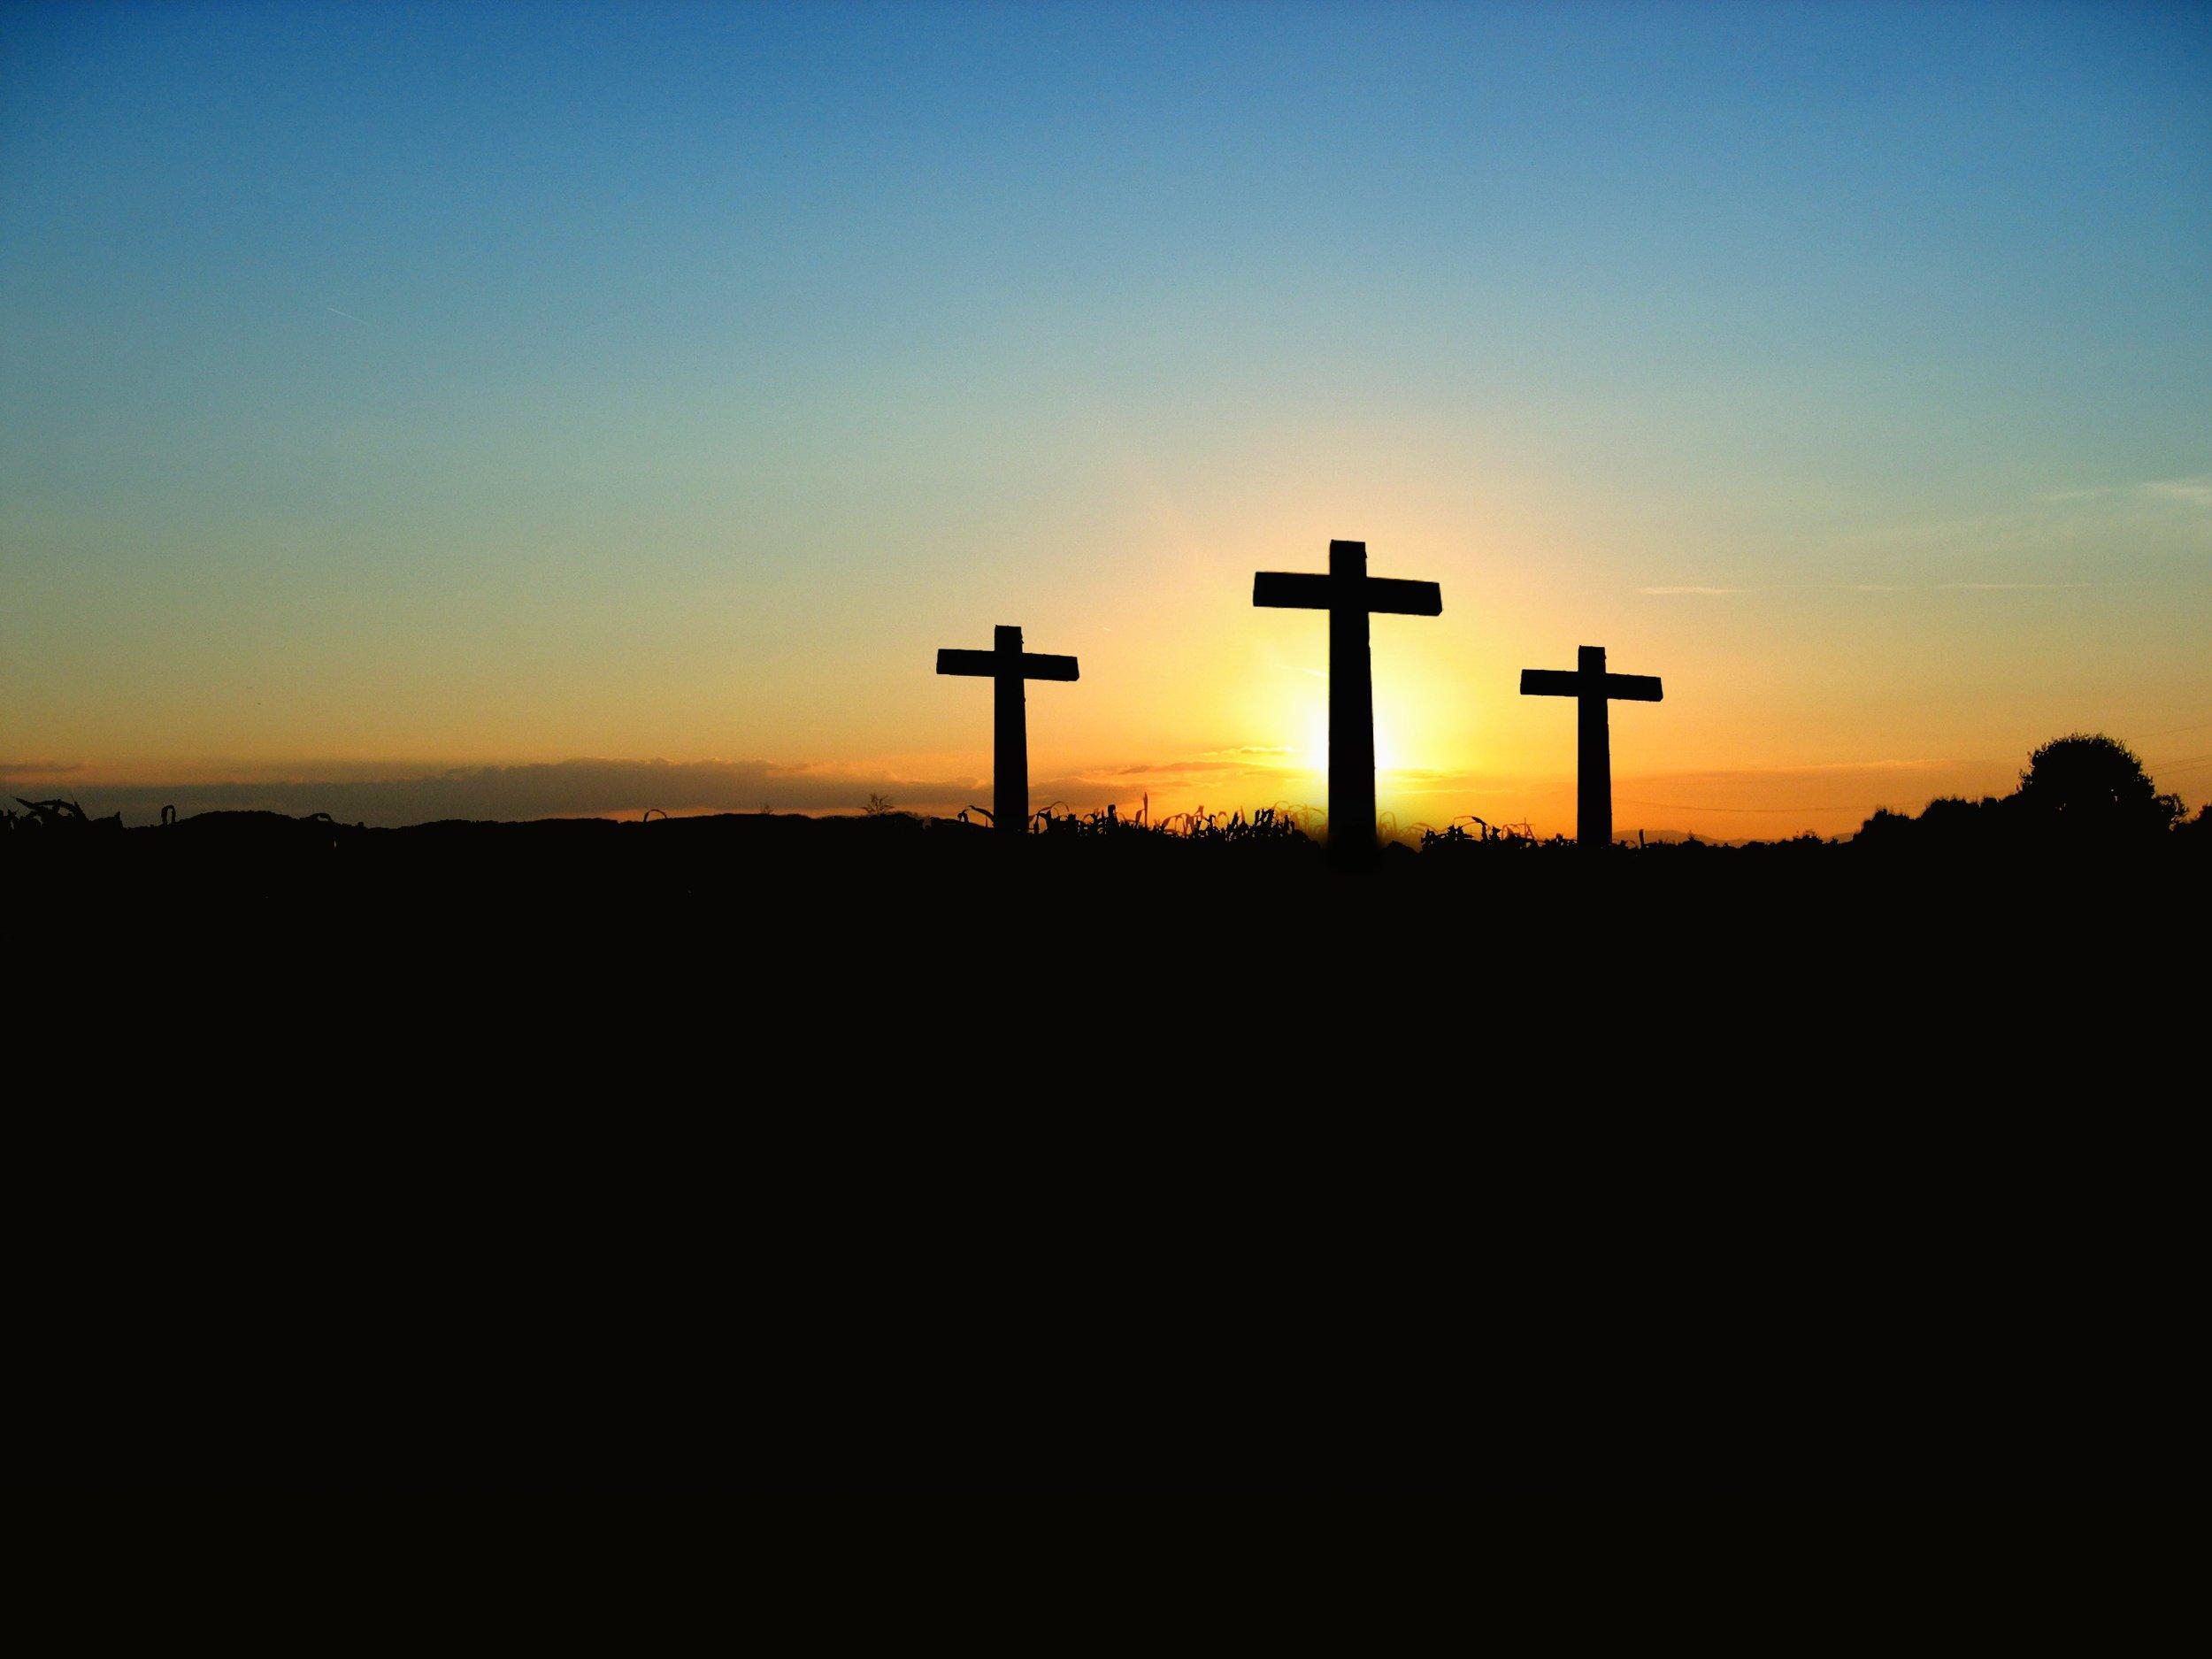 cross-sunset-sunrise-hill-70847 (1).jpeg